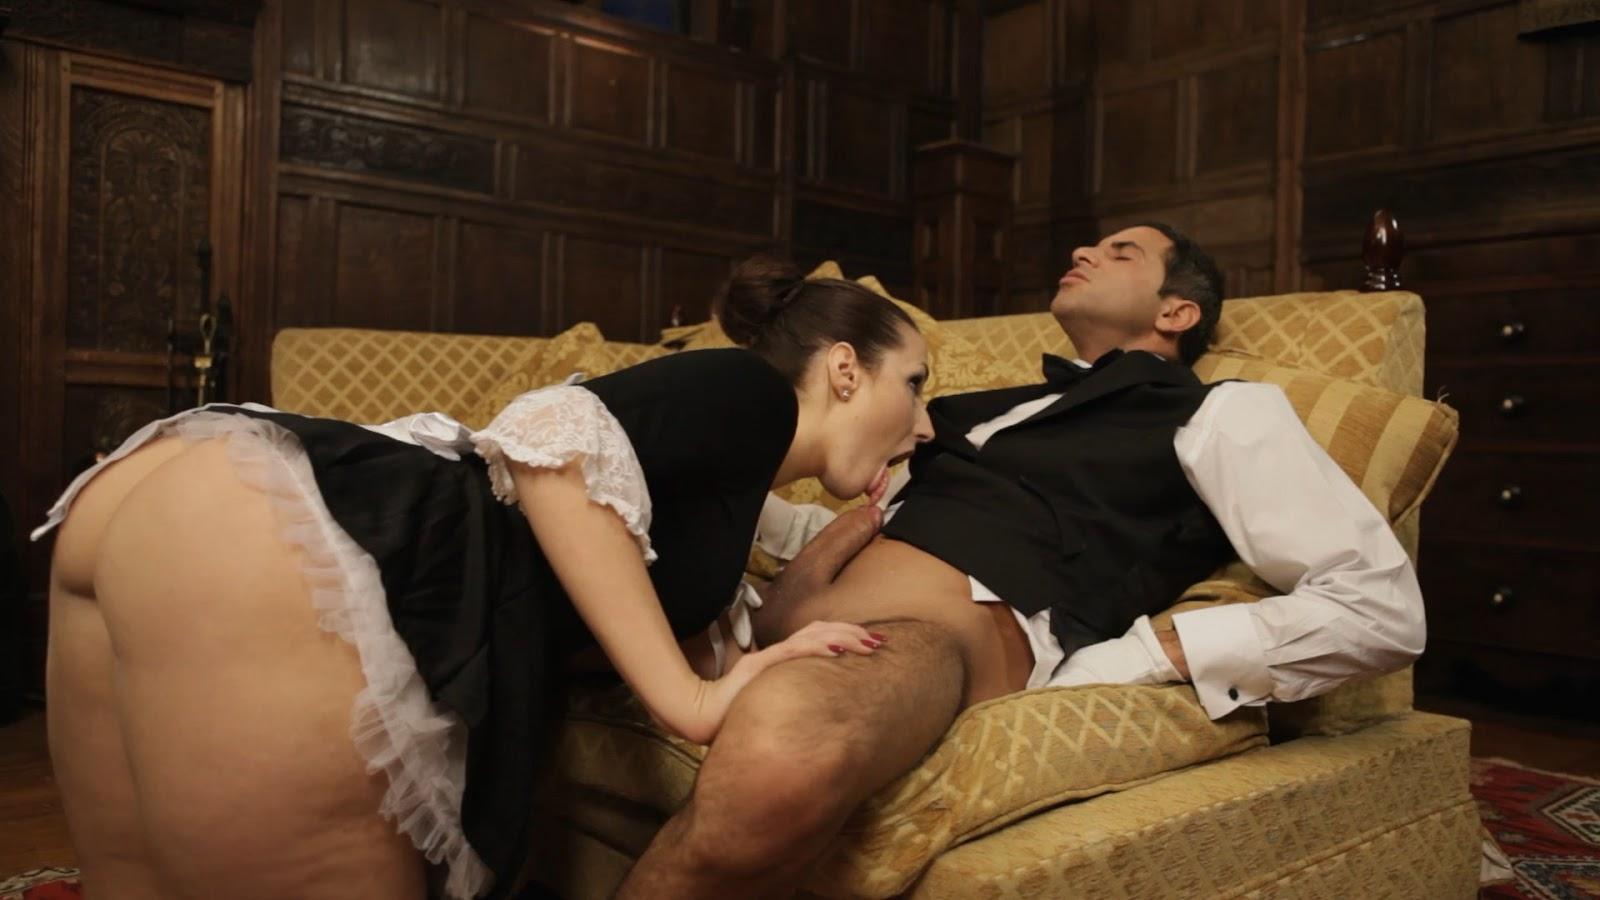 Хозяйка наказала горничную порно, Хозяйка наказала служанку - видео ctr Pages HD 2 фотография